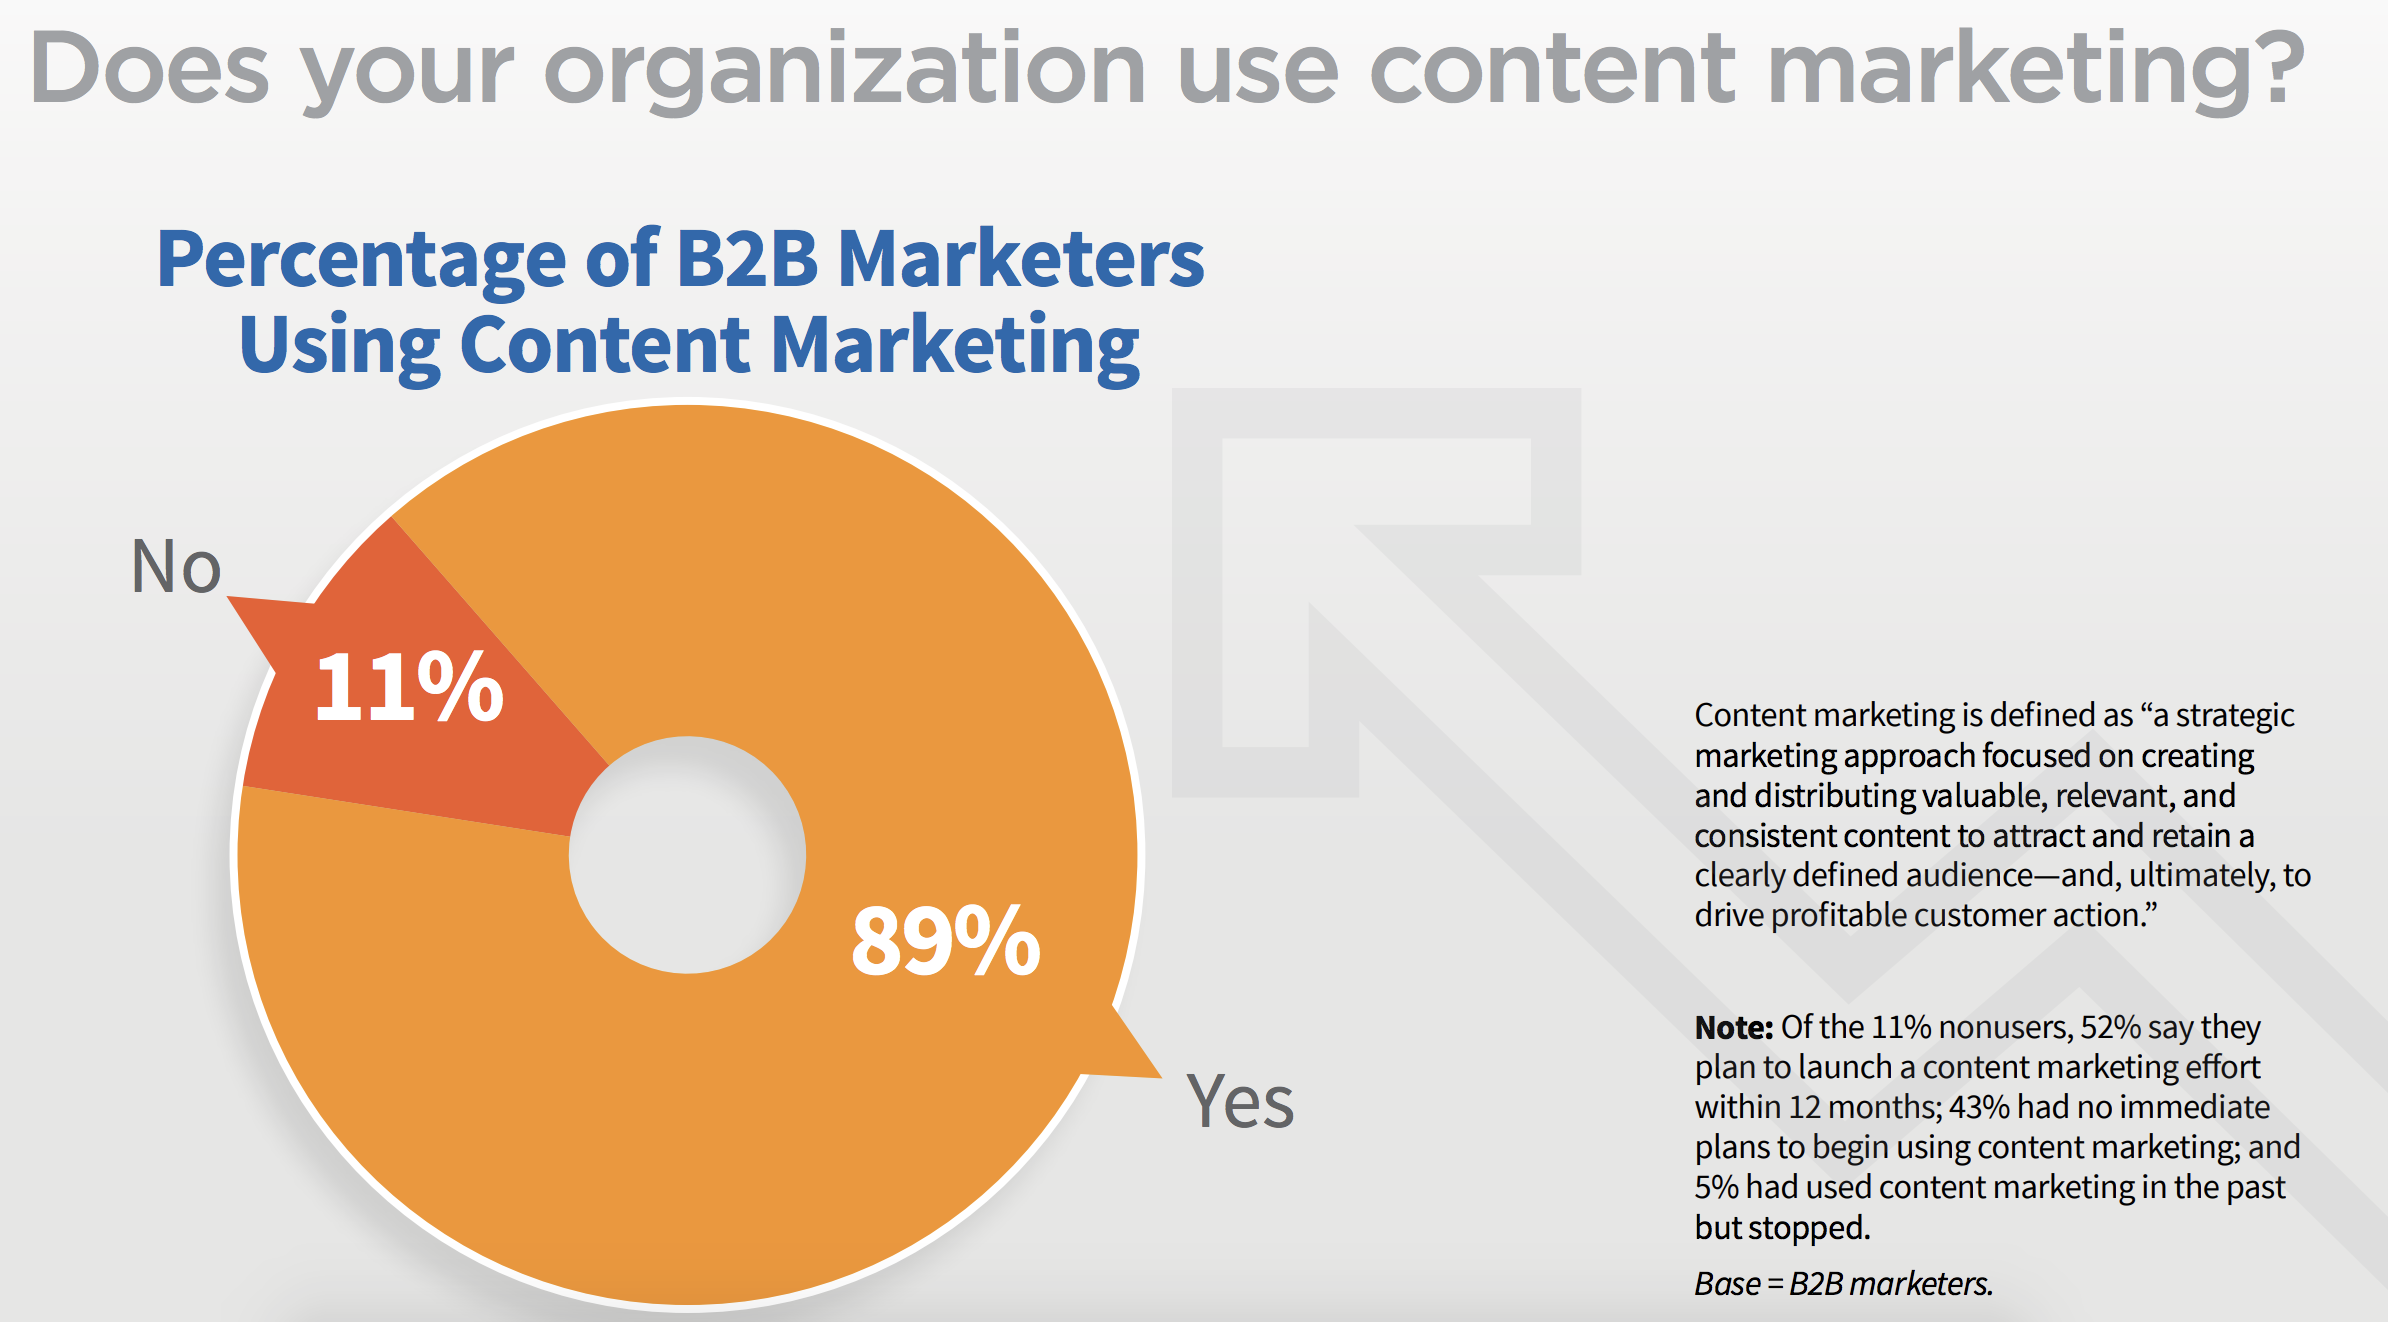 b2b marketers using content marketing